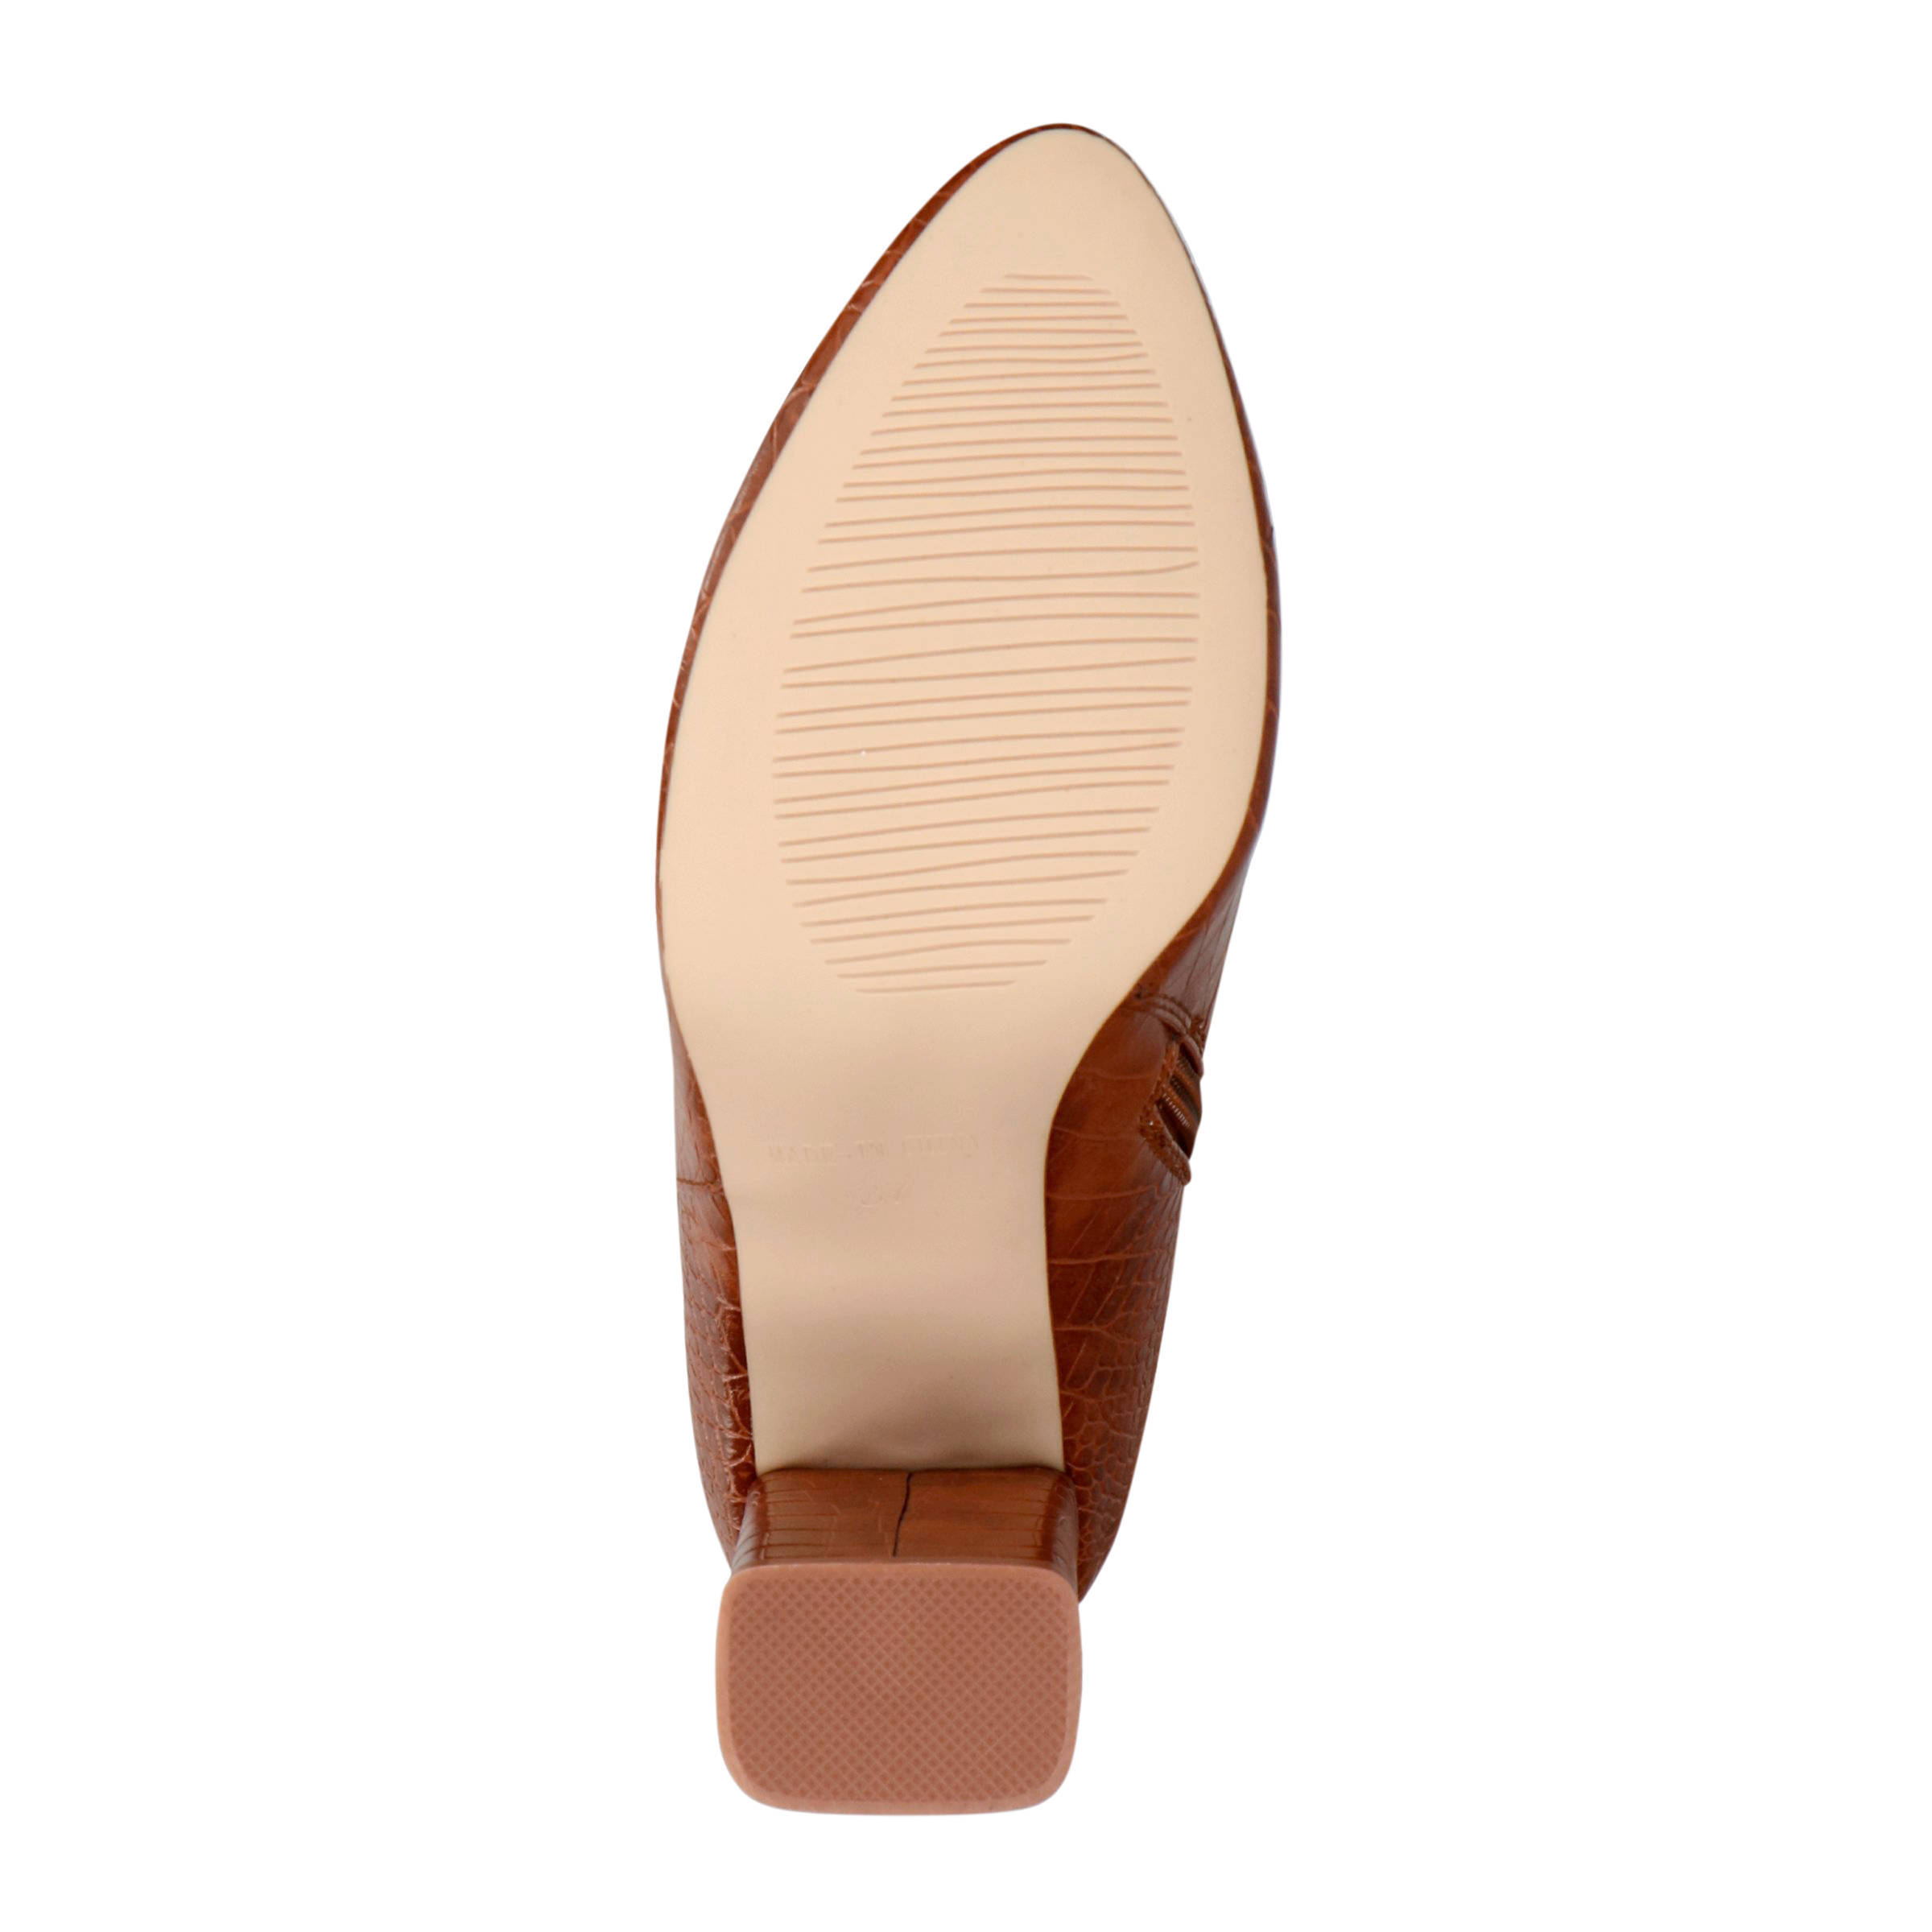 Raid Marion 1 laarzen crocoprint bruin | wehkamp